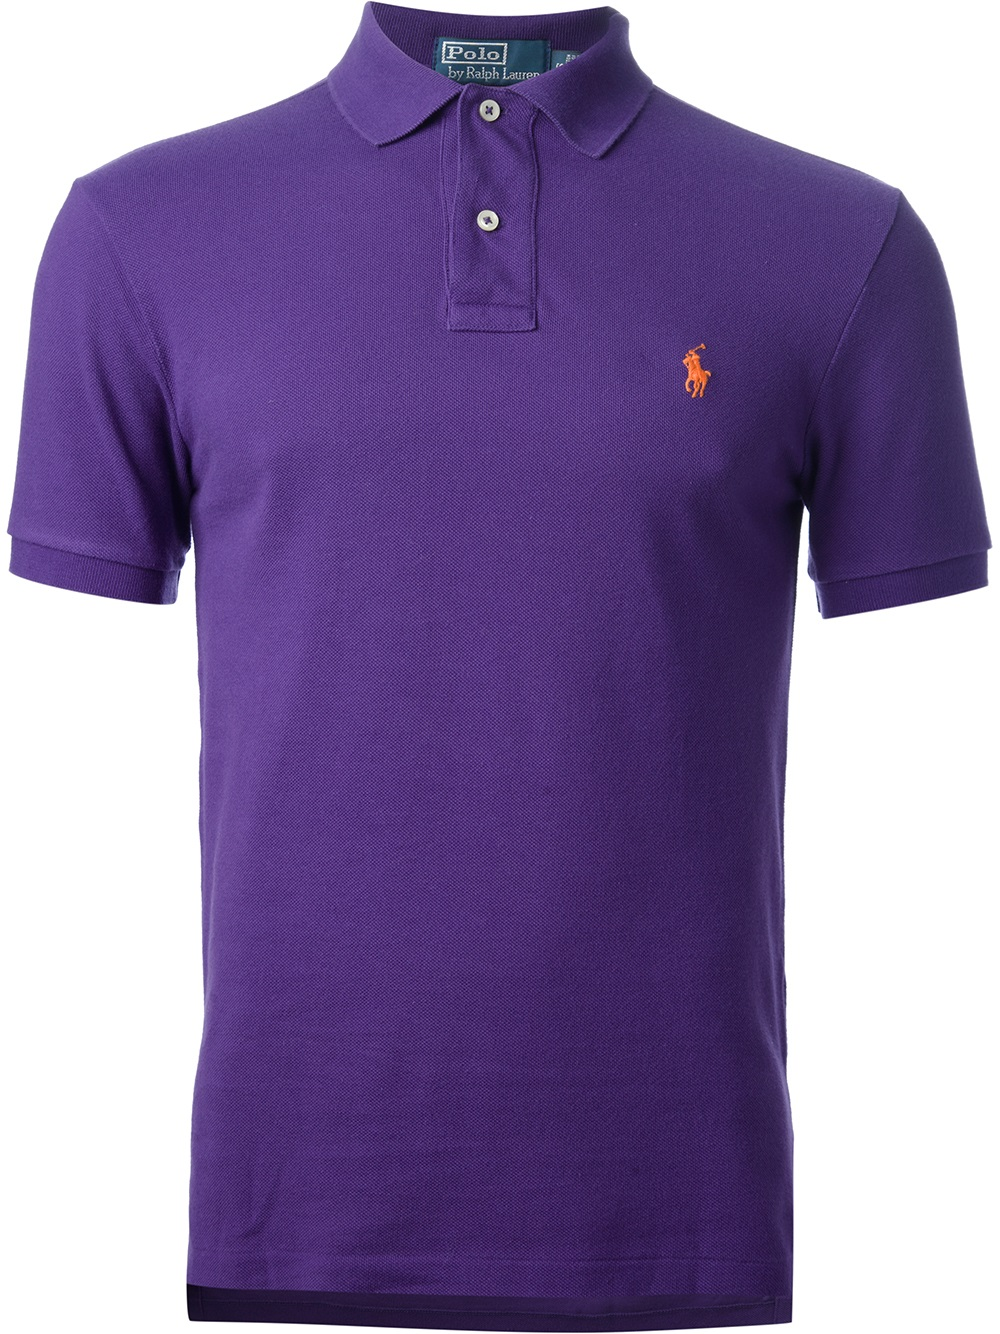 Polo Ralph Lauren Short Sleeve Polo Shirt In Purple For